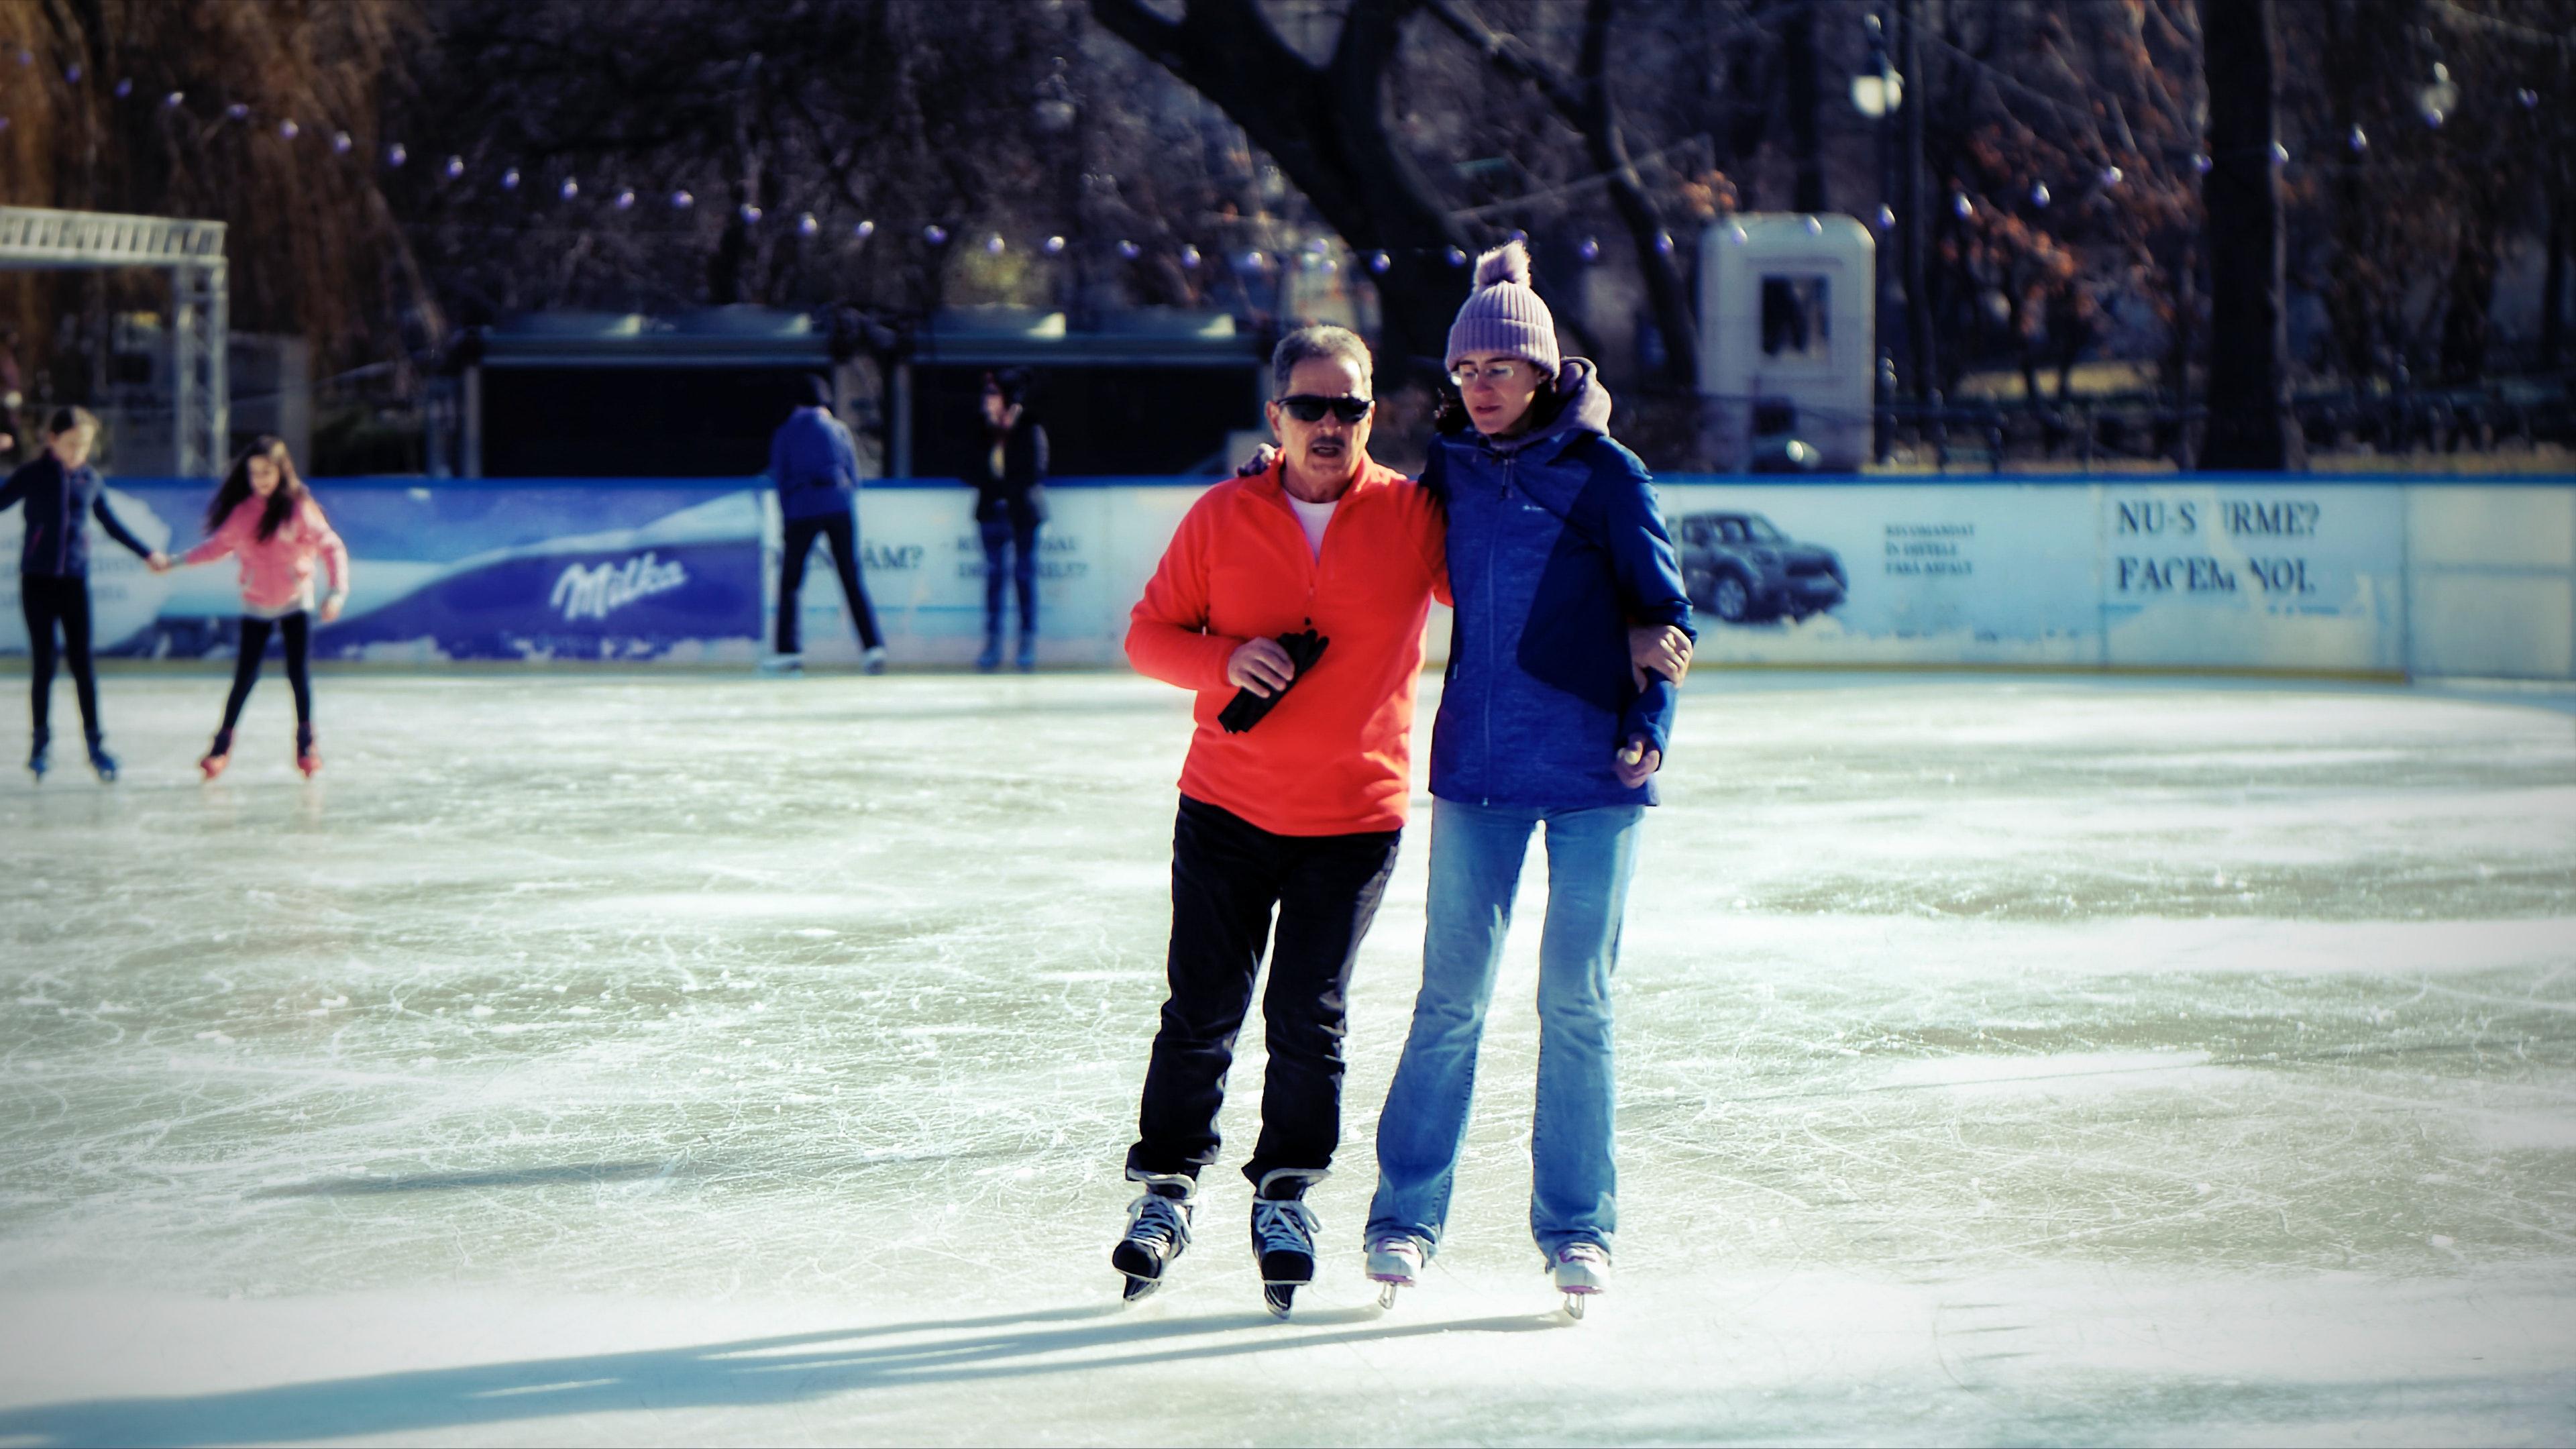 Free stock photo of ice, ice skating rink, people skating